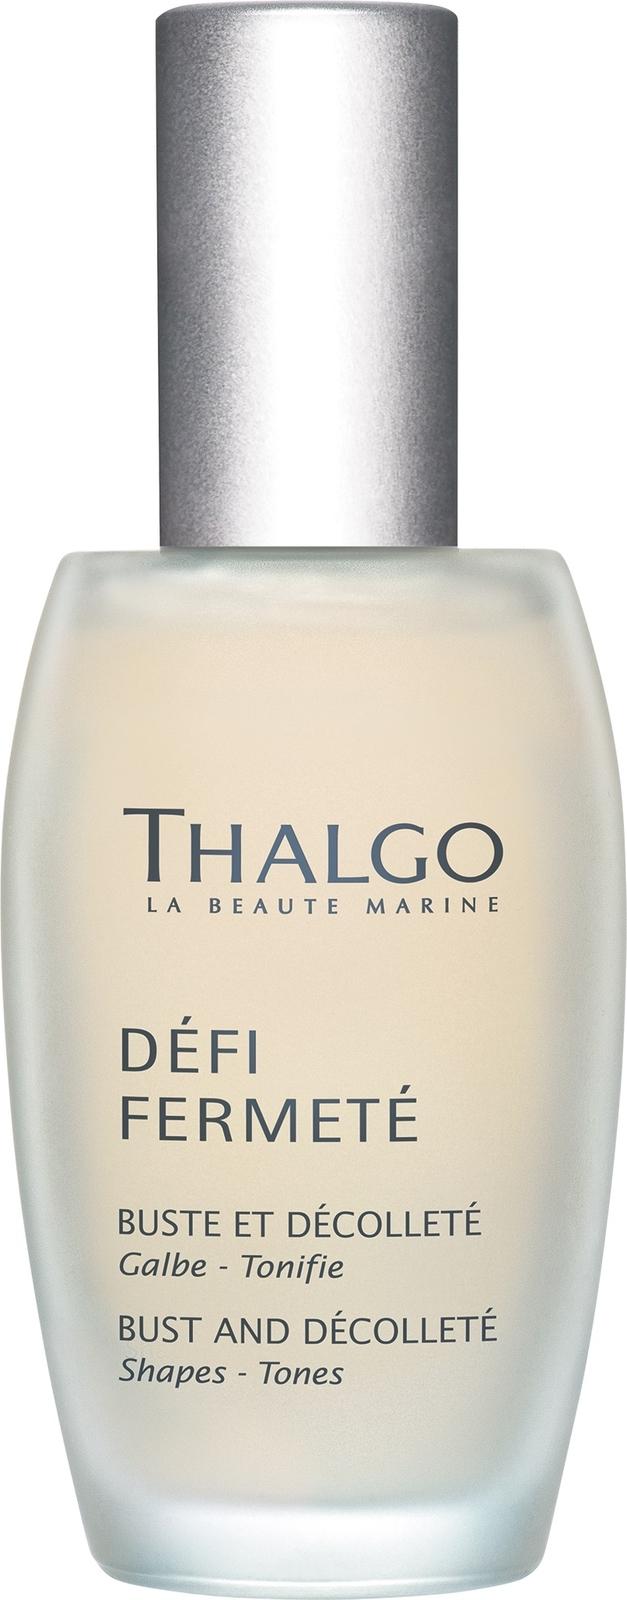 Сыворотка для бюста Thalgo Bust and Decollete, 50 мл